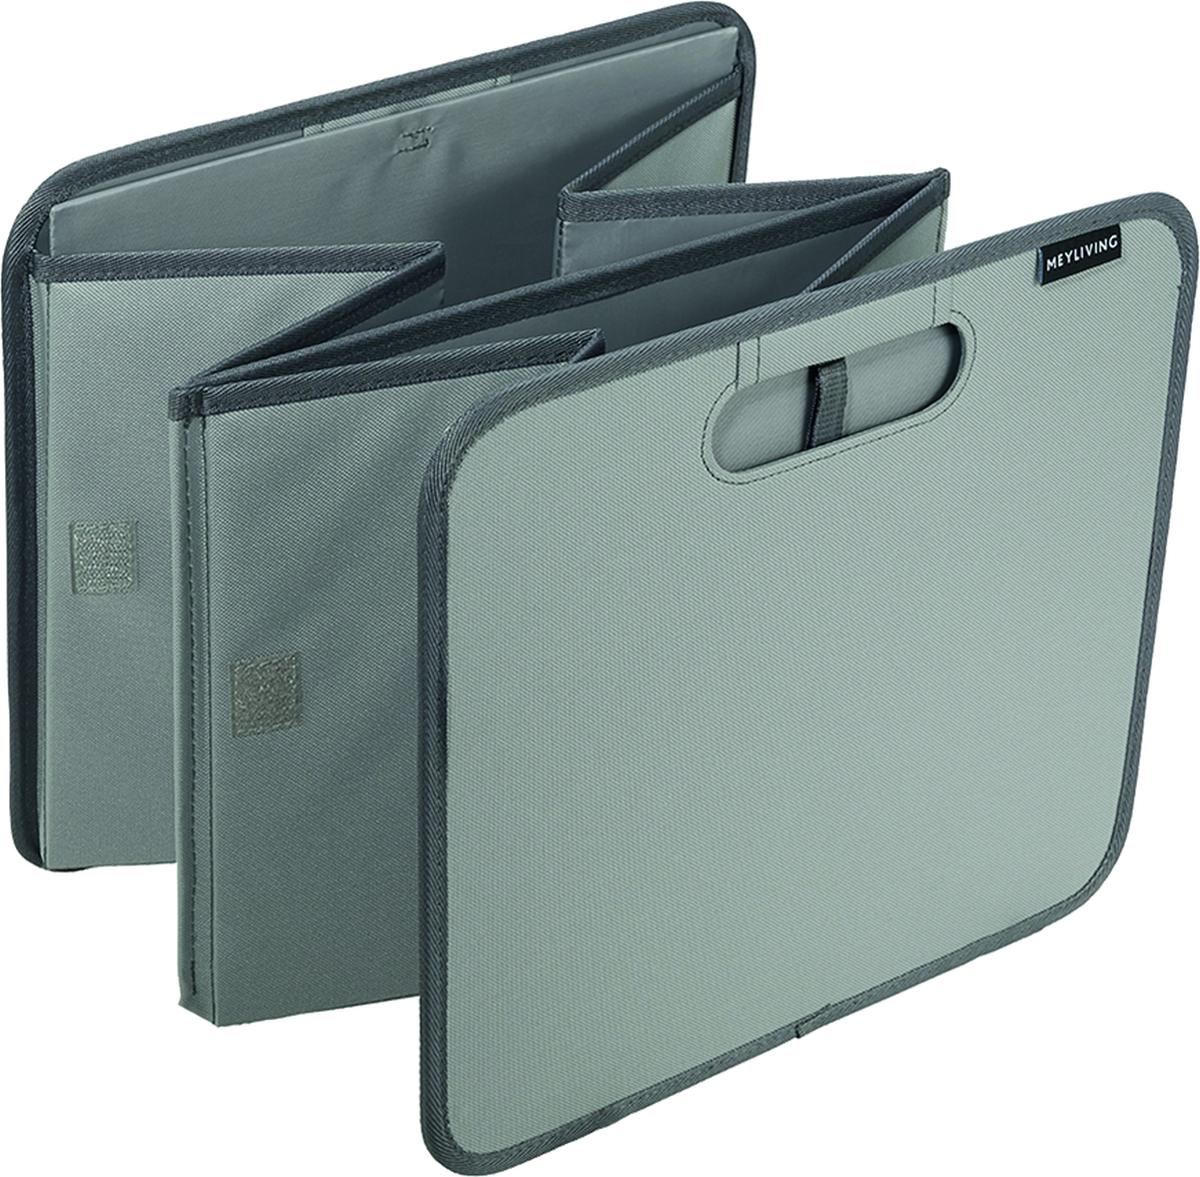 Meori Faltbox Meyliving XL Grey